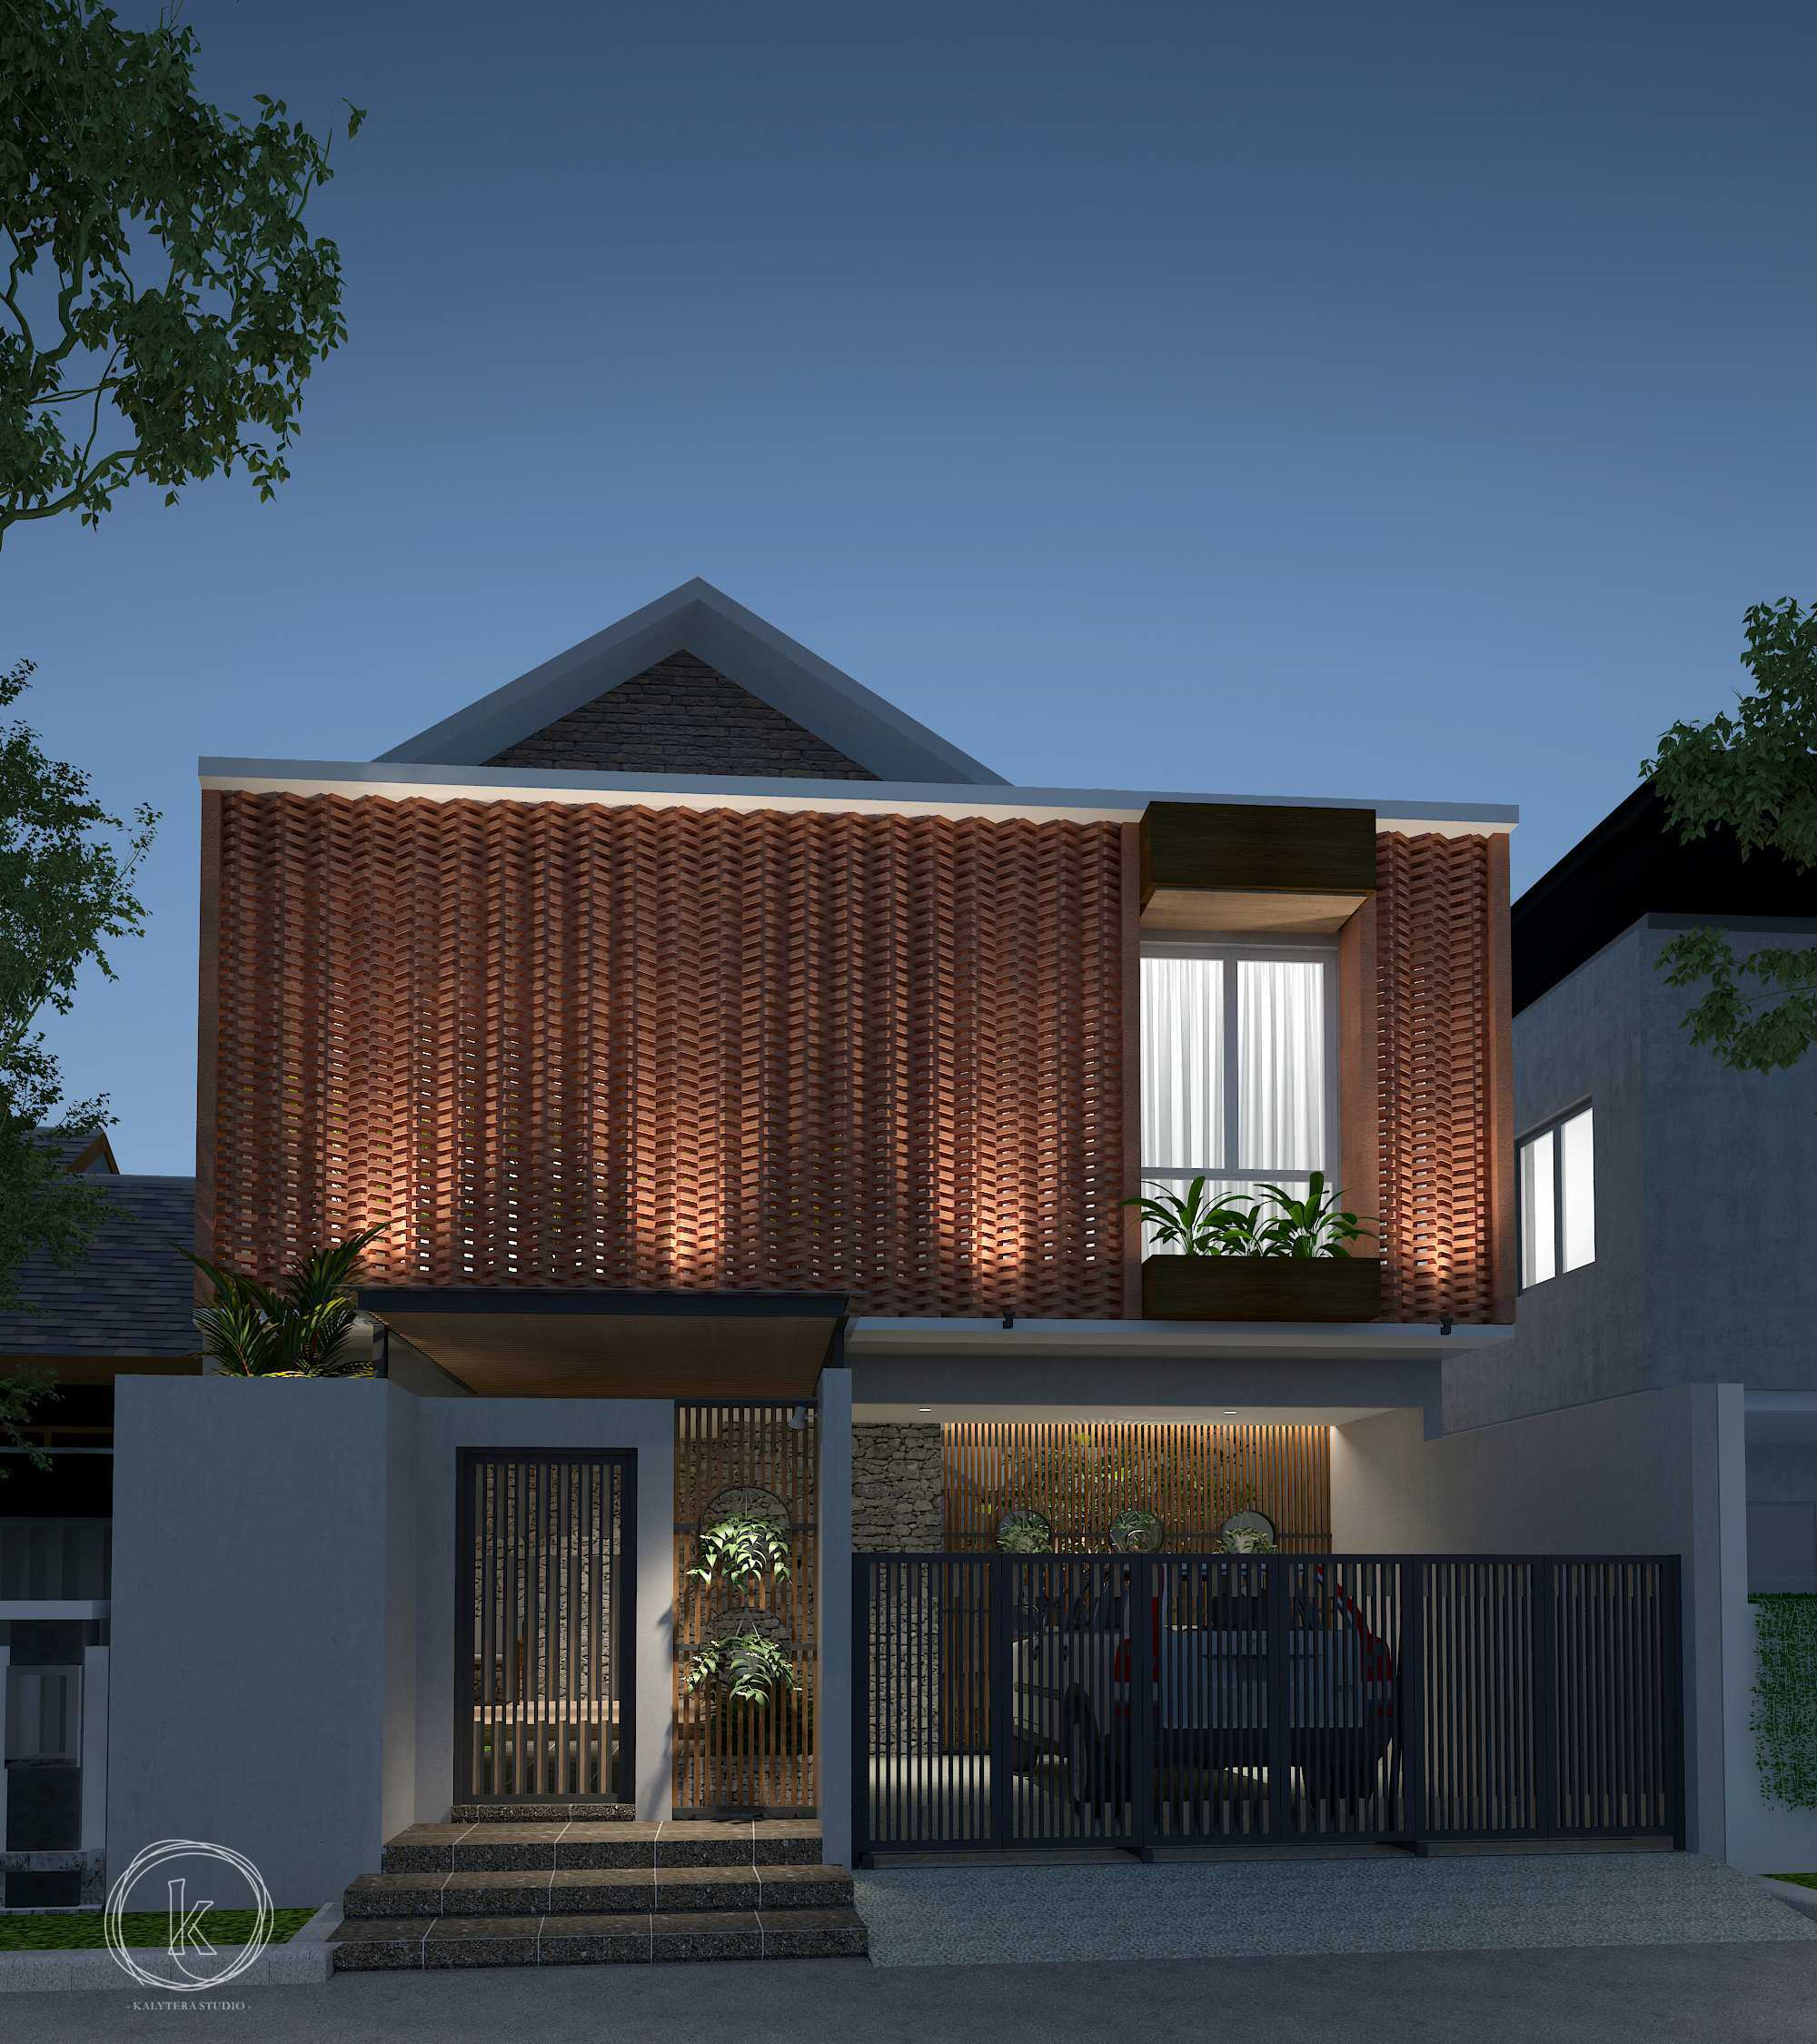 Kalytera Studio Fd-House Surakarta, Kota Surakarta, Jawa Tengah, Indonesia Surakarta, Kota Surakarta, Jawa Tengah, Indonesia Kalytera-Studio-Fd-House   51322